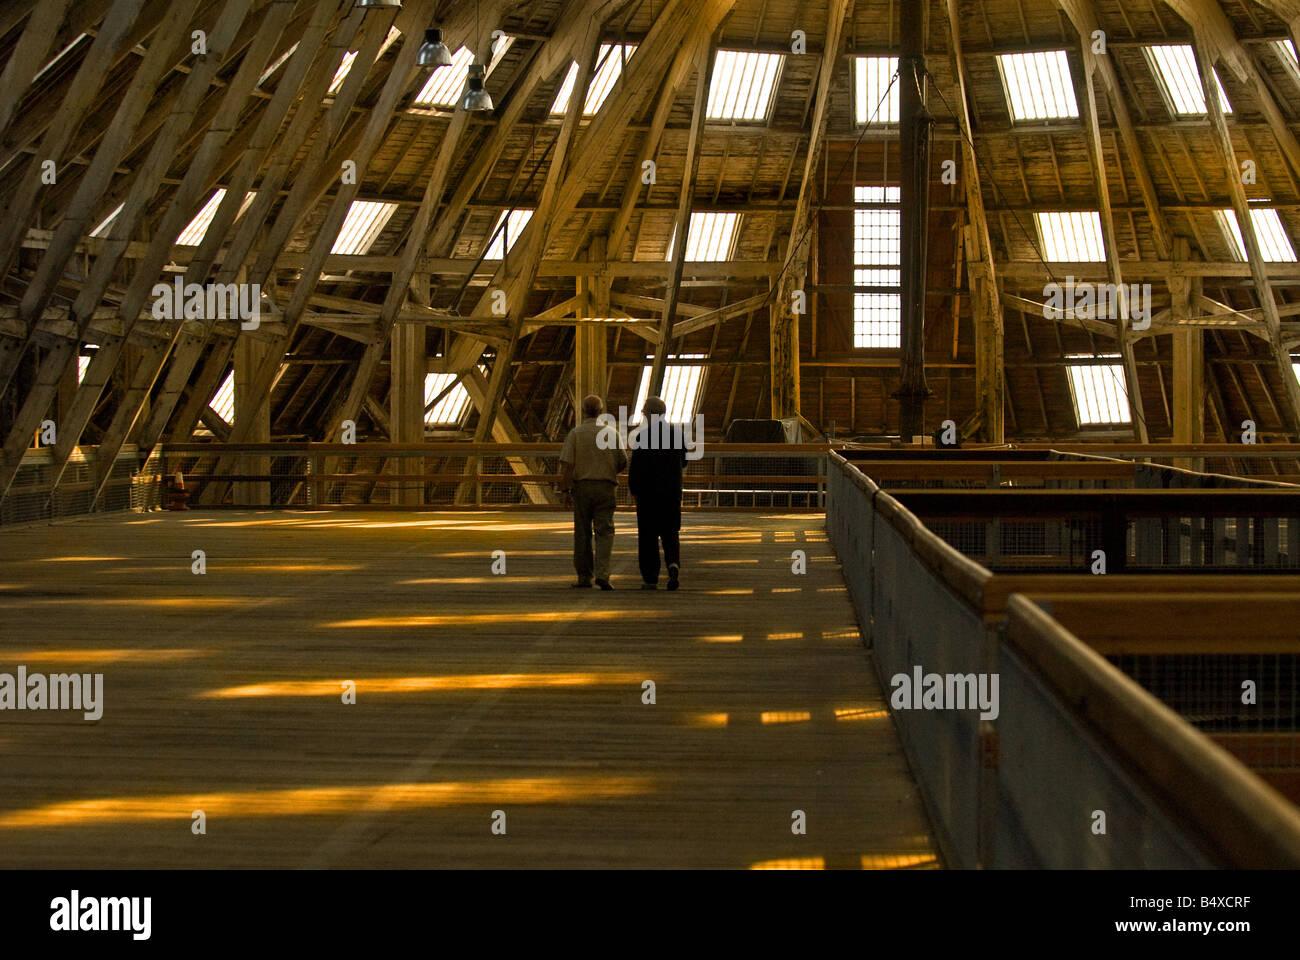 Two men walking along the mezzanine floor of No 3 Slip Cover Chatham Historic Dockyard in Kent. - Stock Image